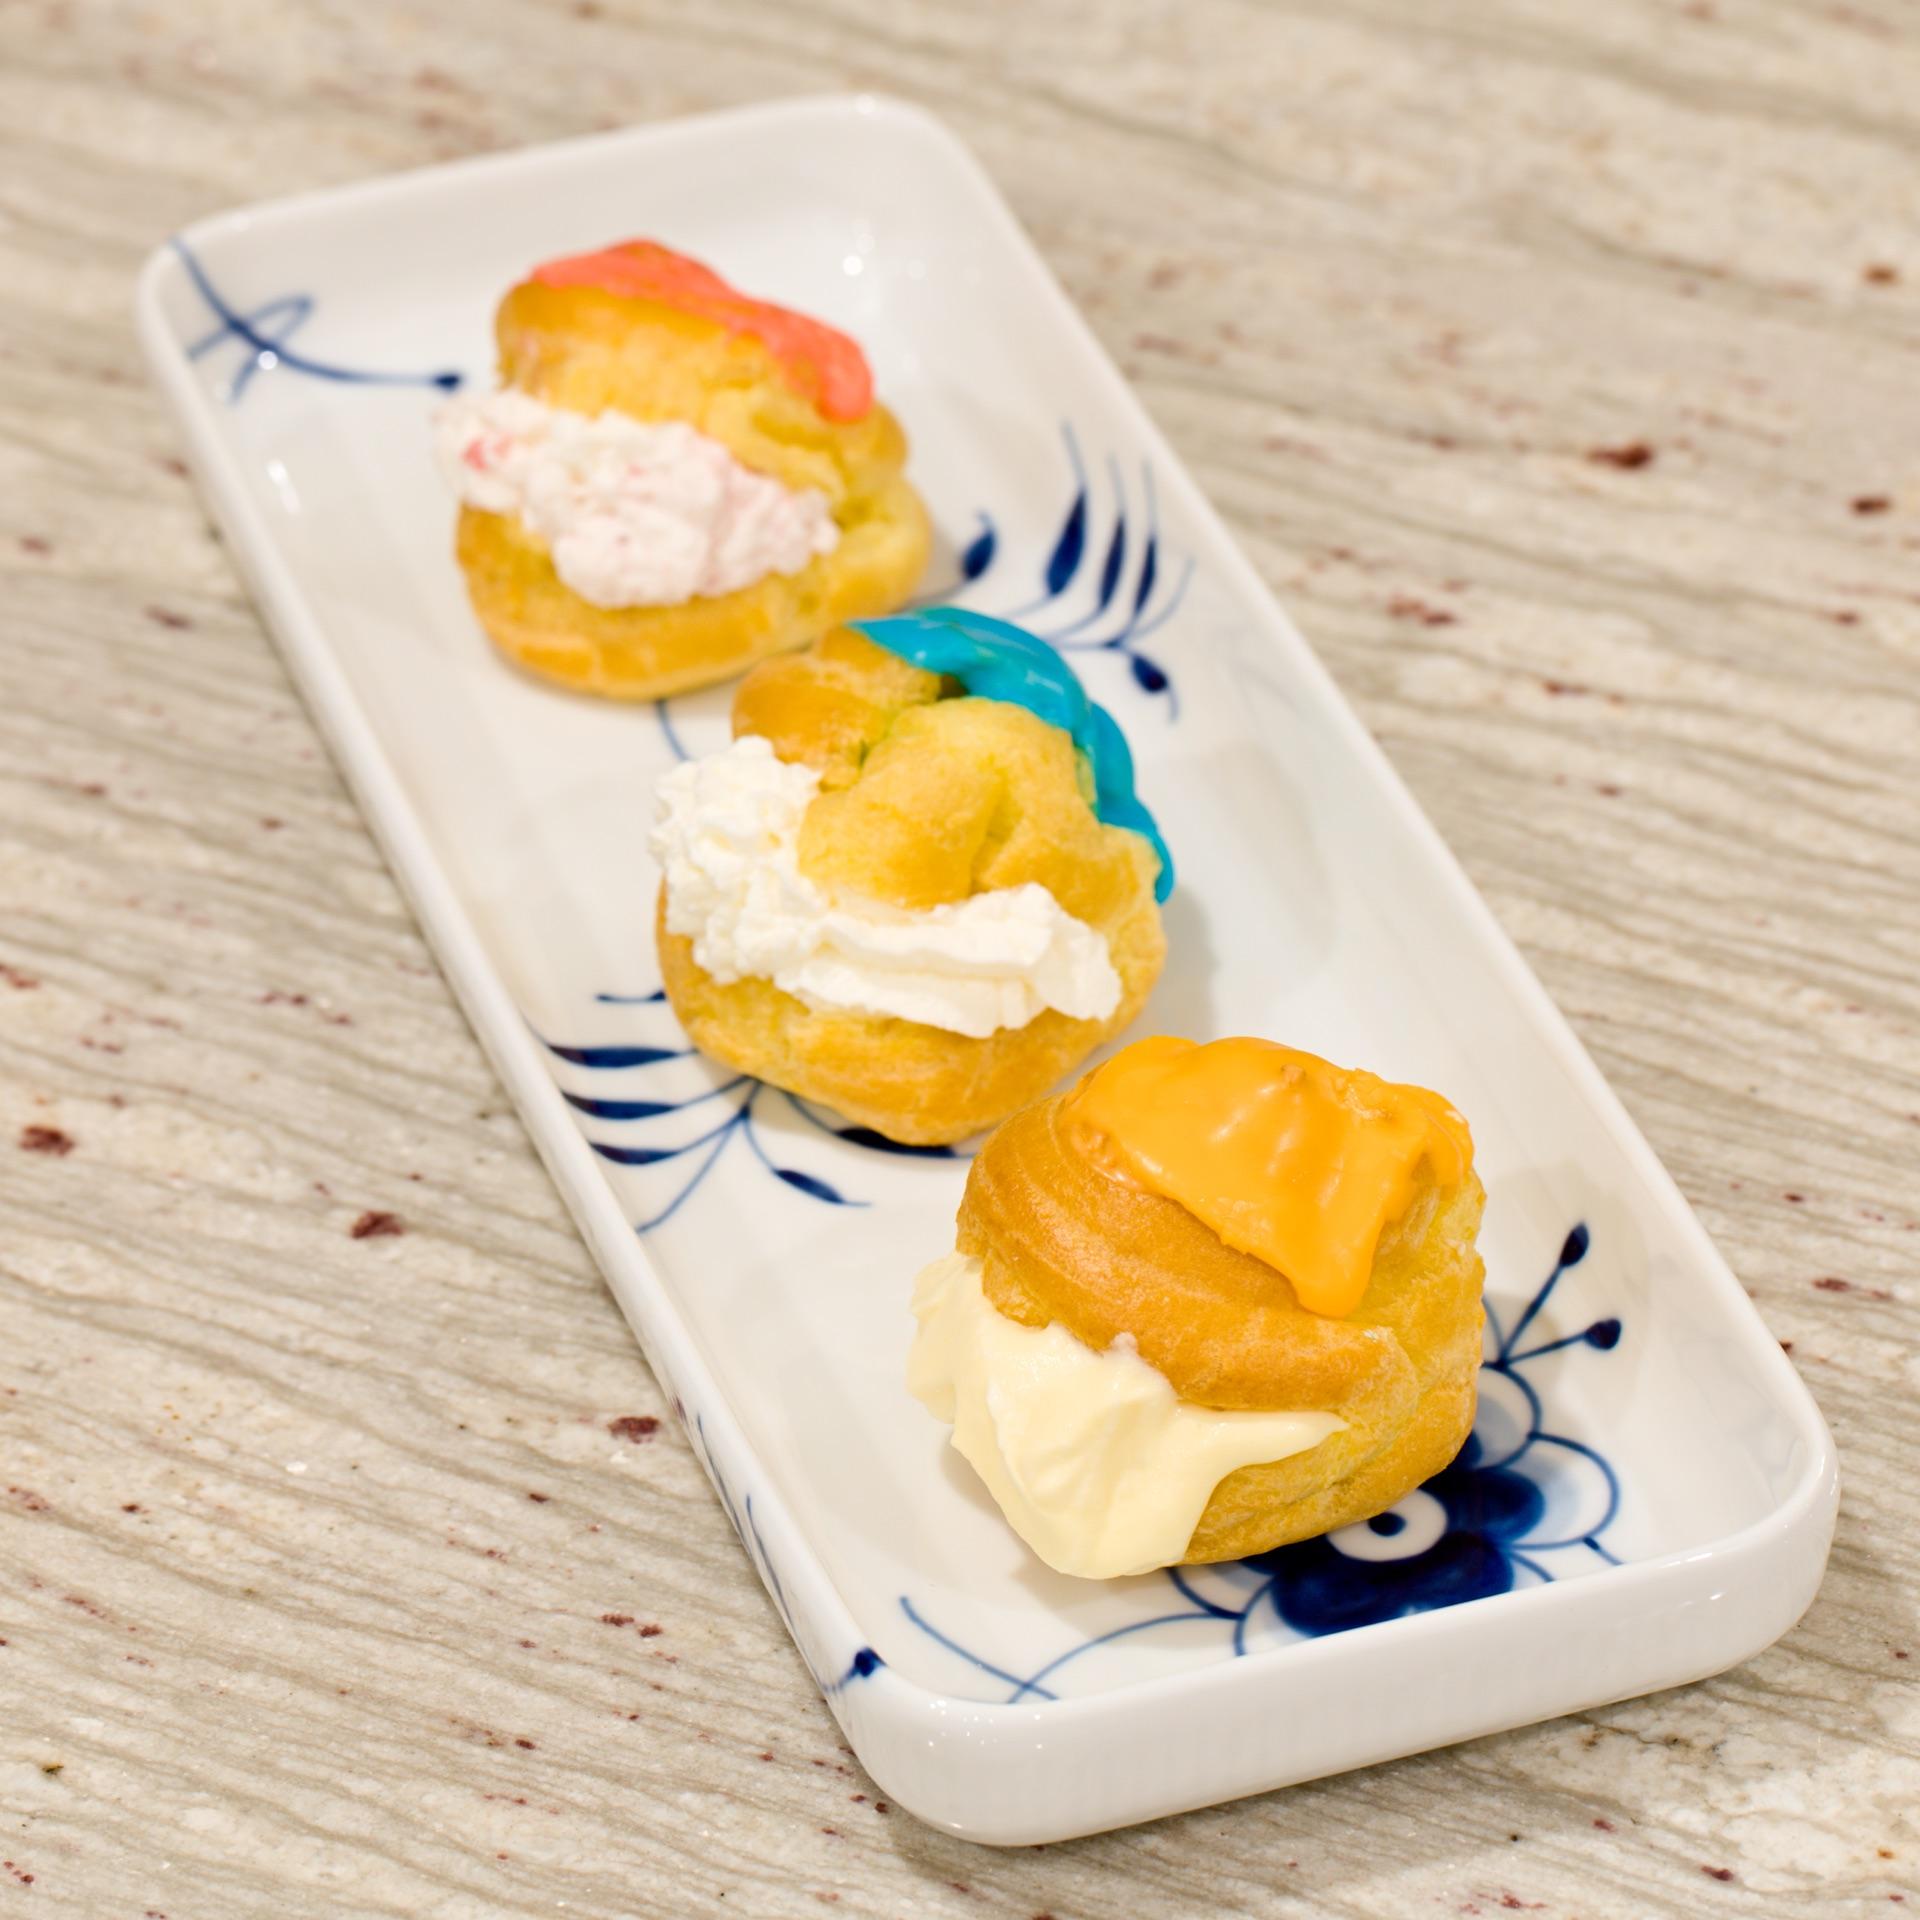 Fastelavnsboller - Choux Pastry